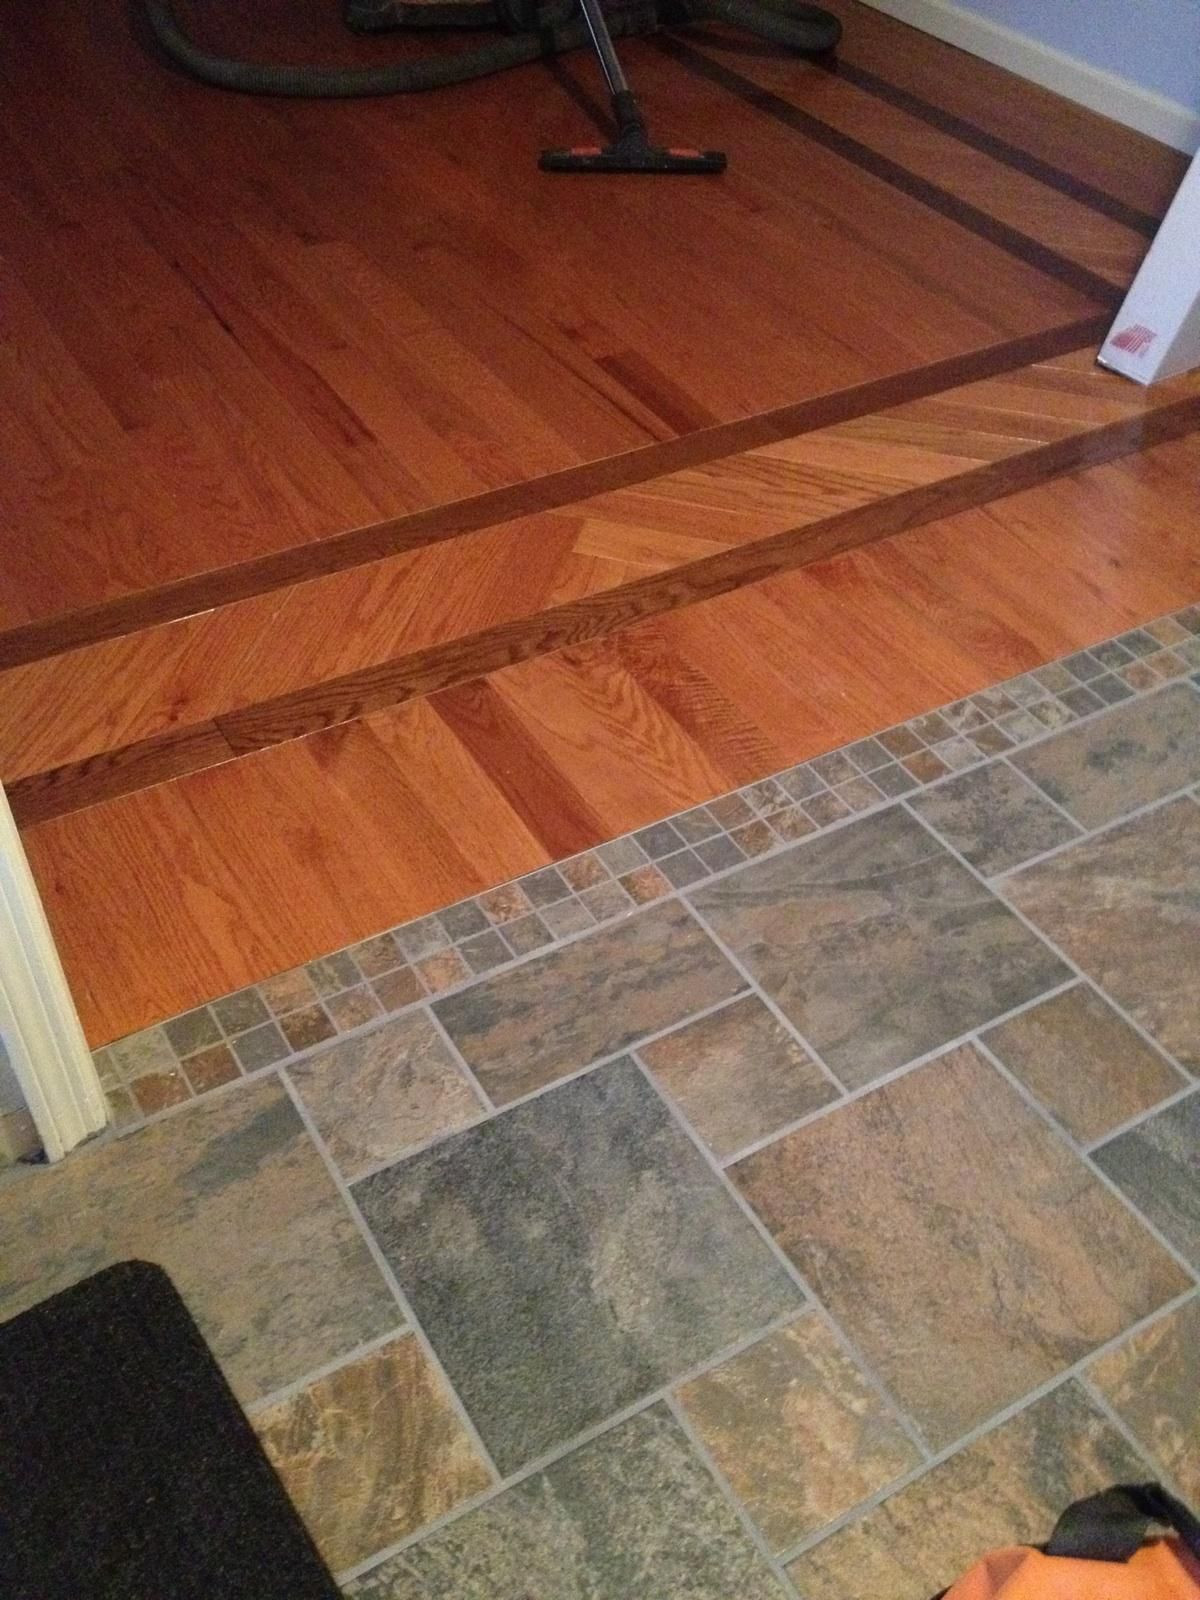 how to install hardwood floor borders of pinwheel slate floor entry foyer connected to hardwood floor with within pinwheel slate floor entry foyer connected to hardwood floor with banded border using a 45deg offset